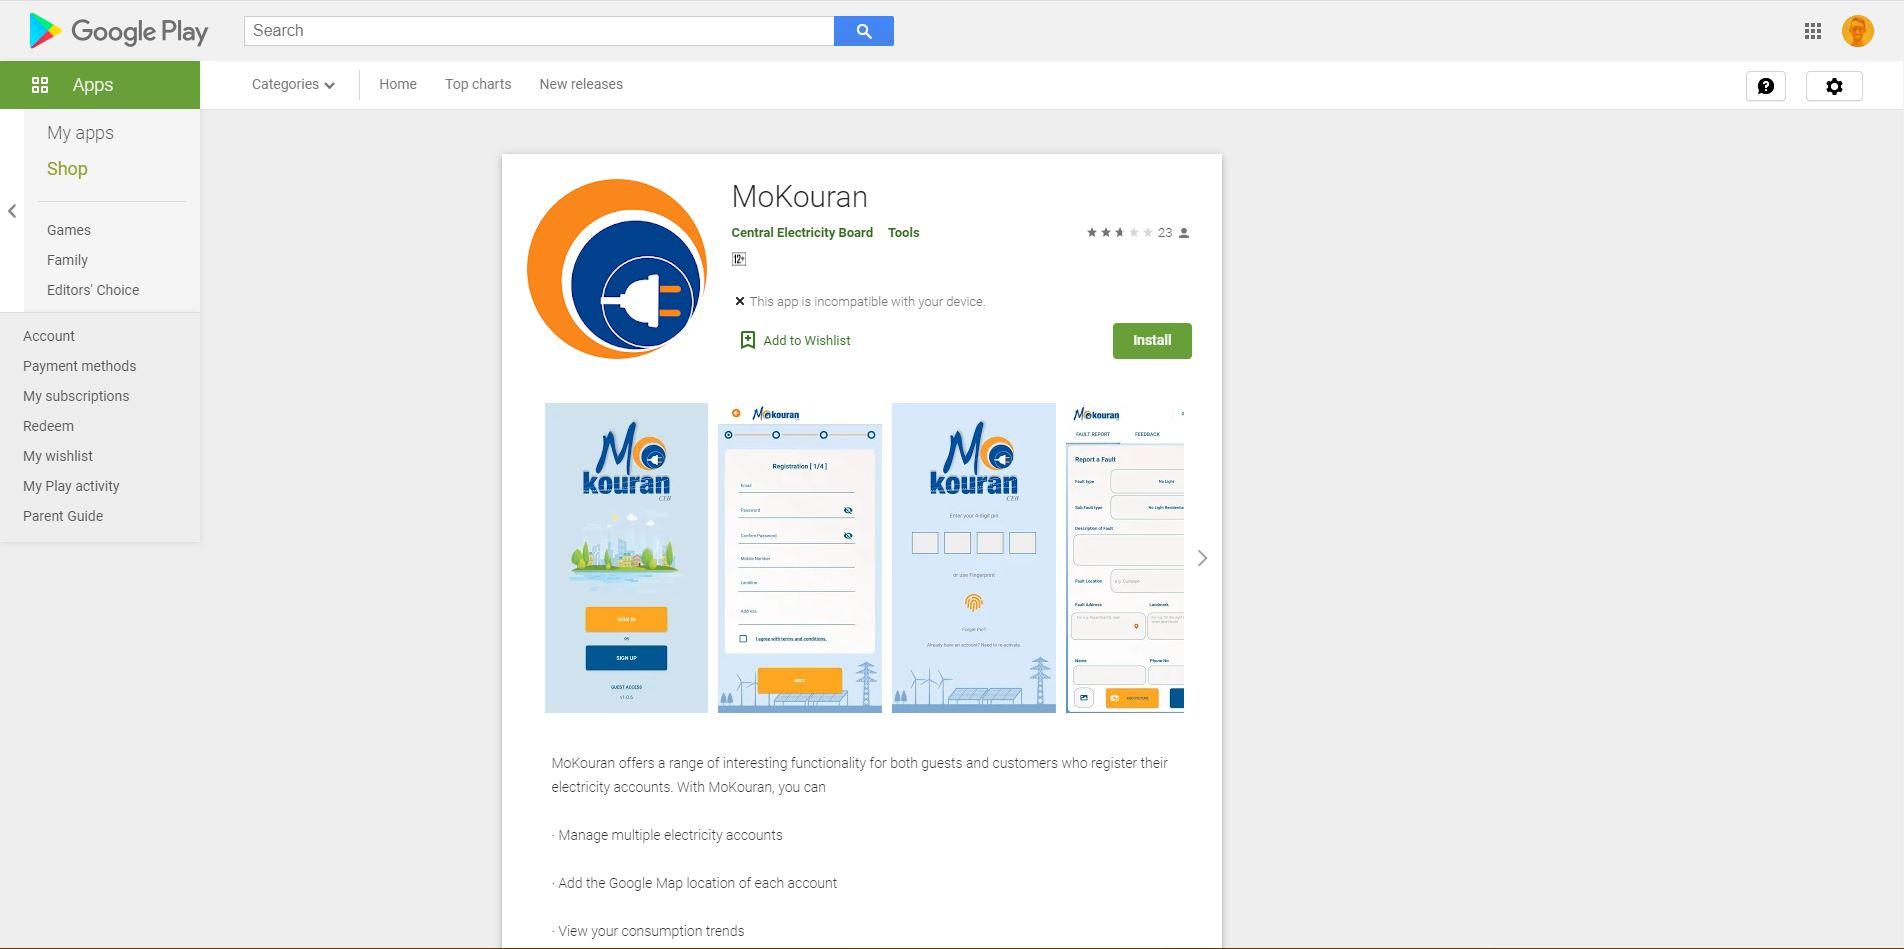 CEB-Digital-Marketing-Mauritius-Ecommerce-Utilities